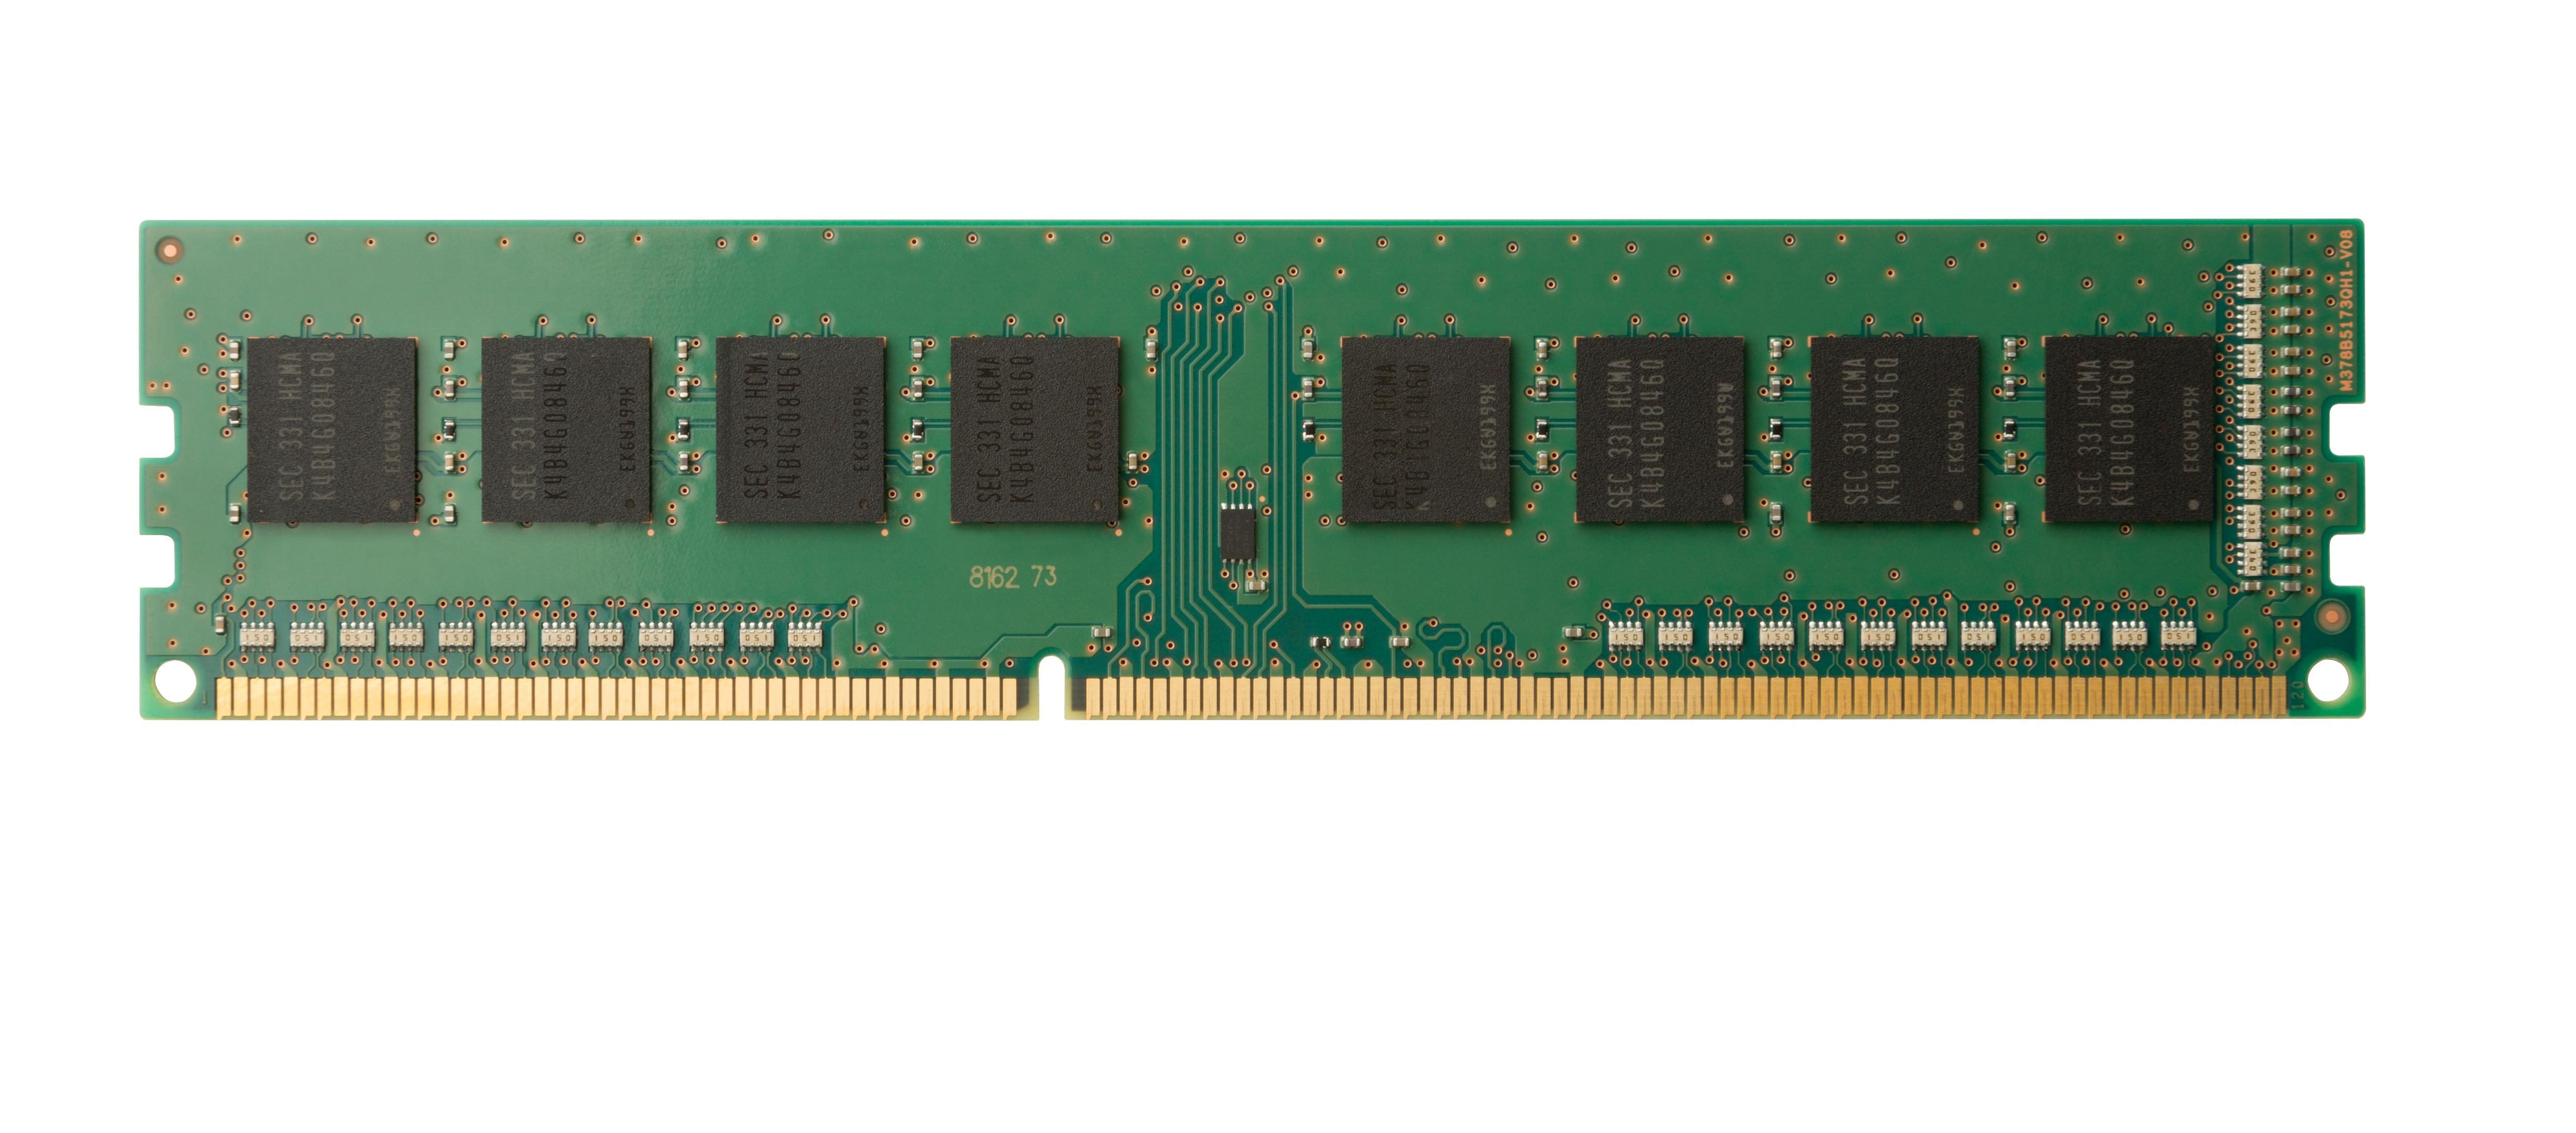 HP RAM non ECC 16 GB (1 x 16 GB) DDR4-2133 0889899036976 T0E52AT 03_T0E52AT